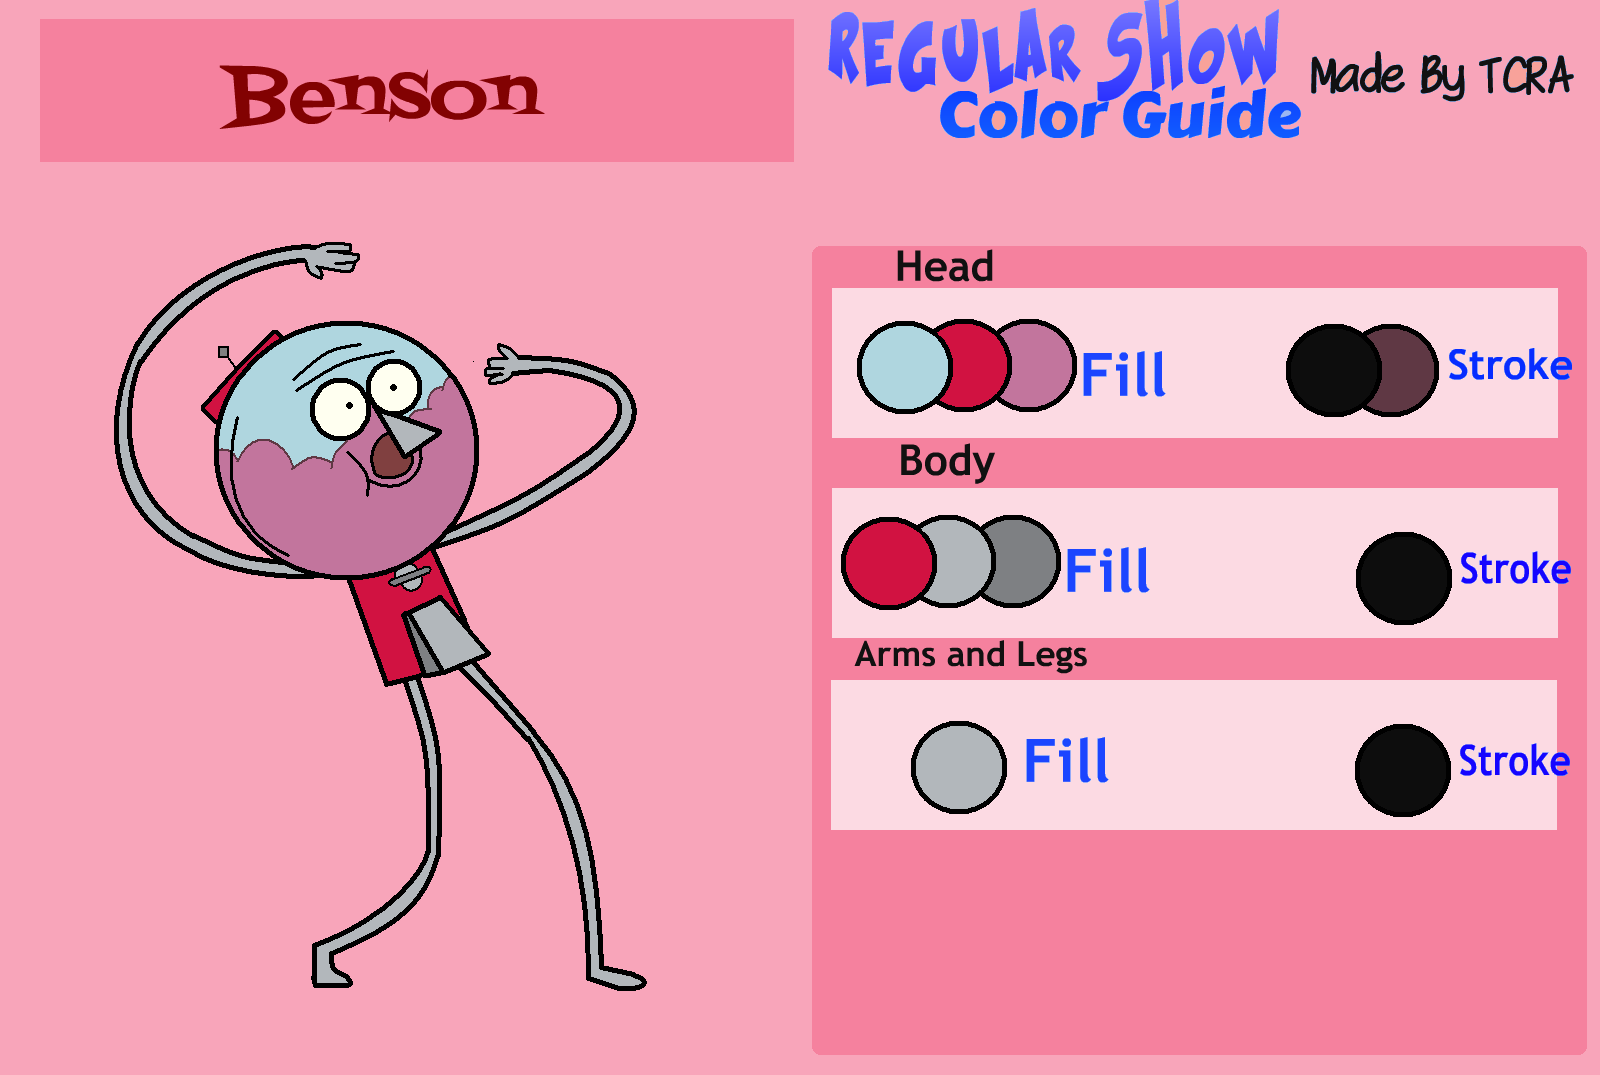 Regular Show Color Guide Benson By Thecraprightart On Deviantart